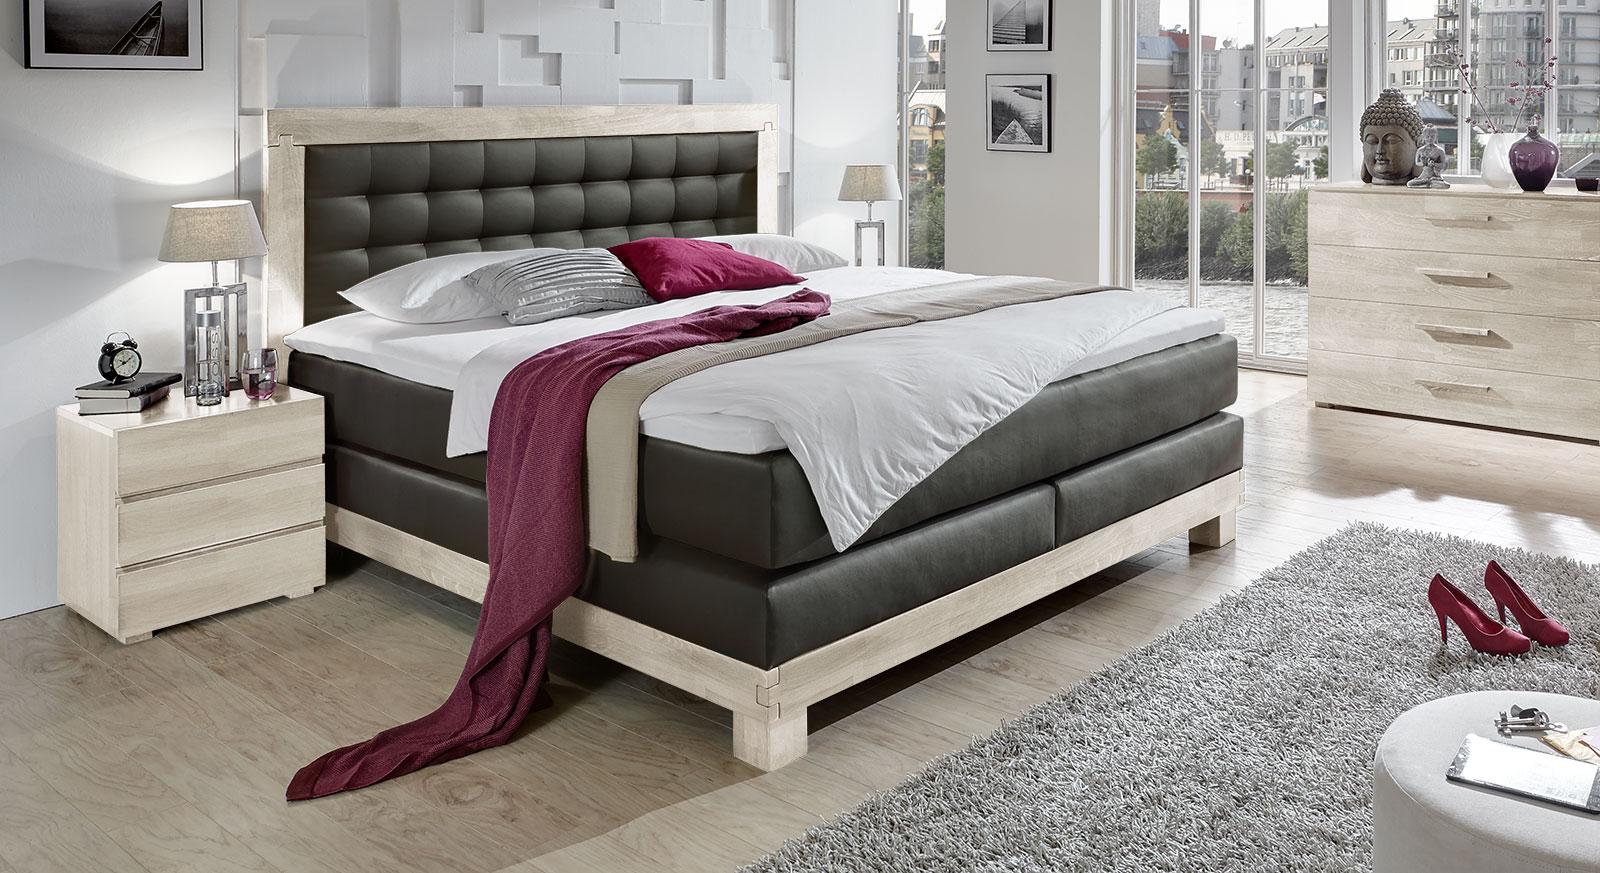 luxus boxspringbett in kunstleder wei inkl topper pratos. Black Bedroom Furniture Sets. Home Design Ideas